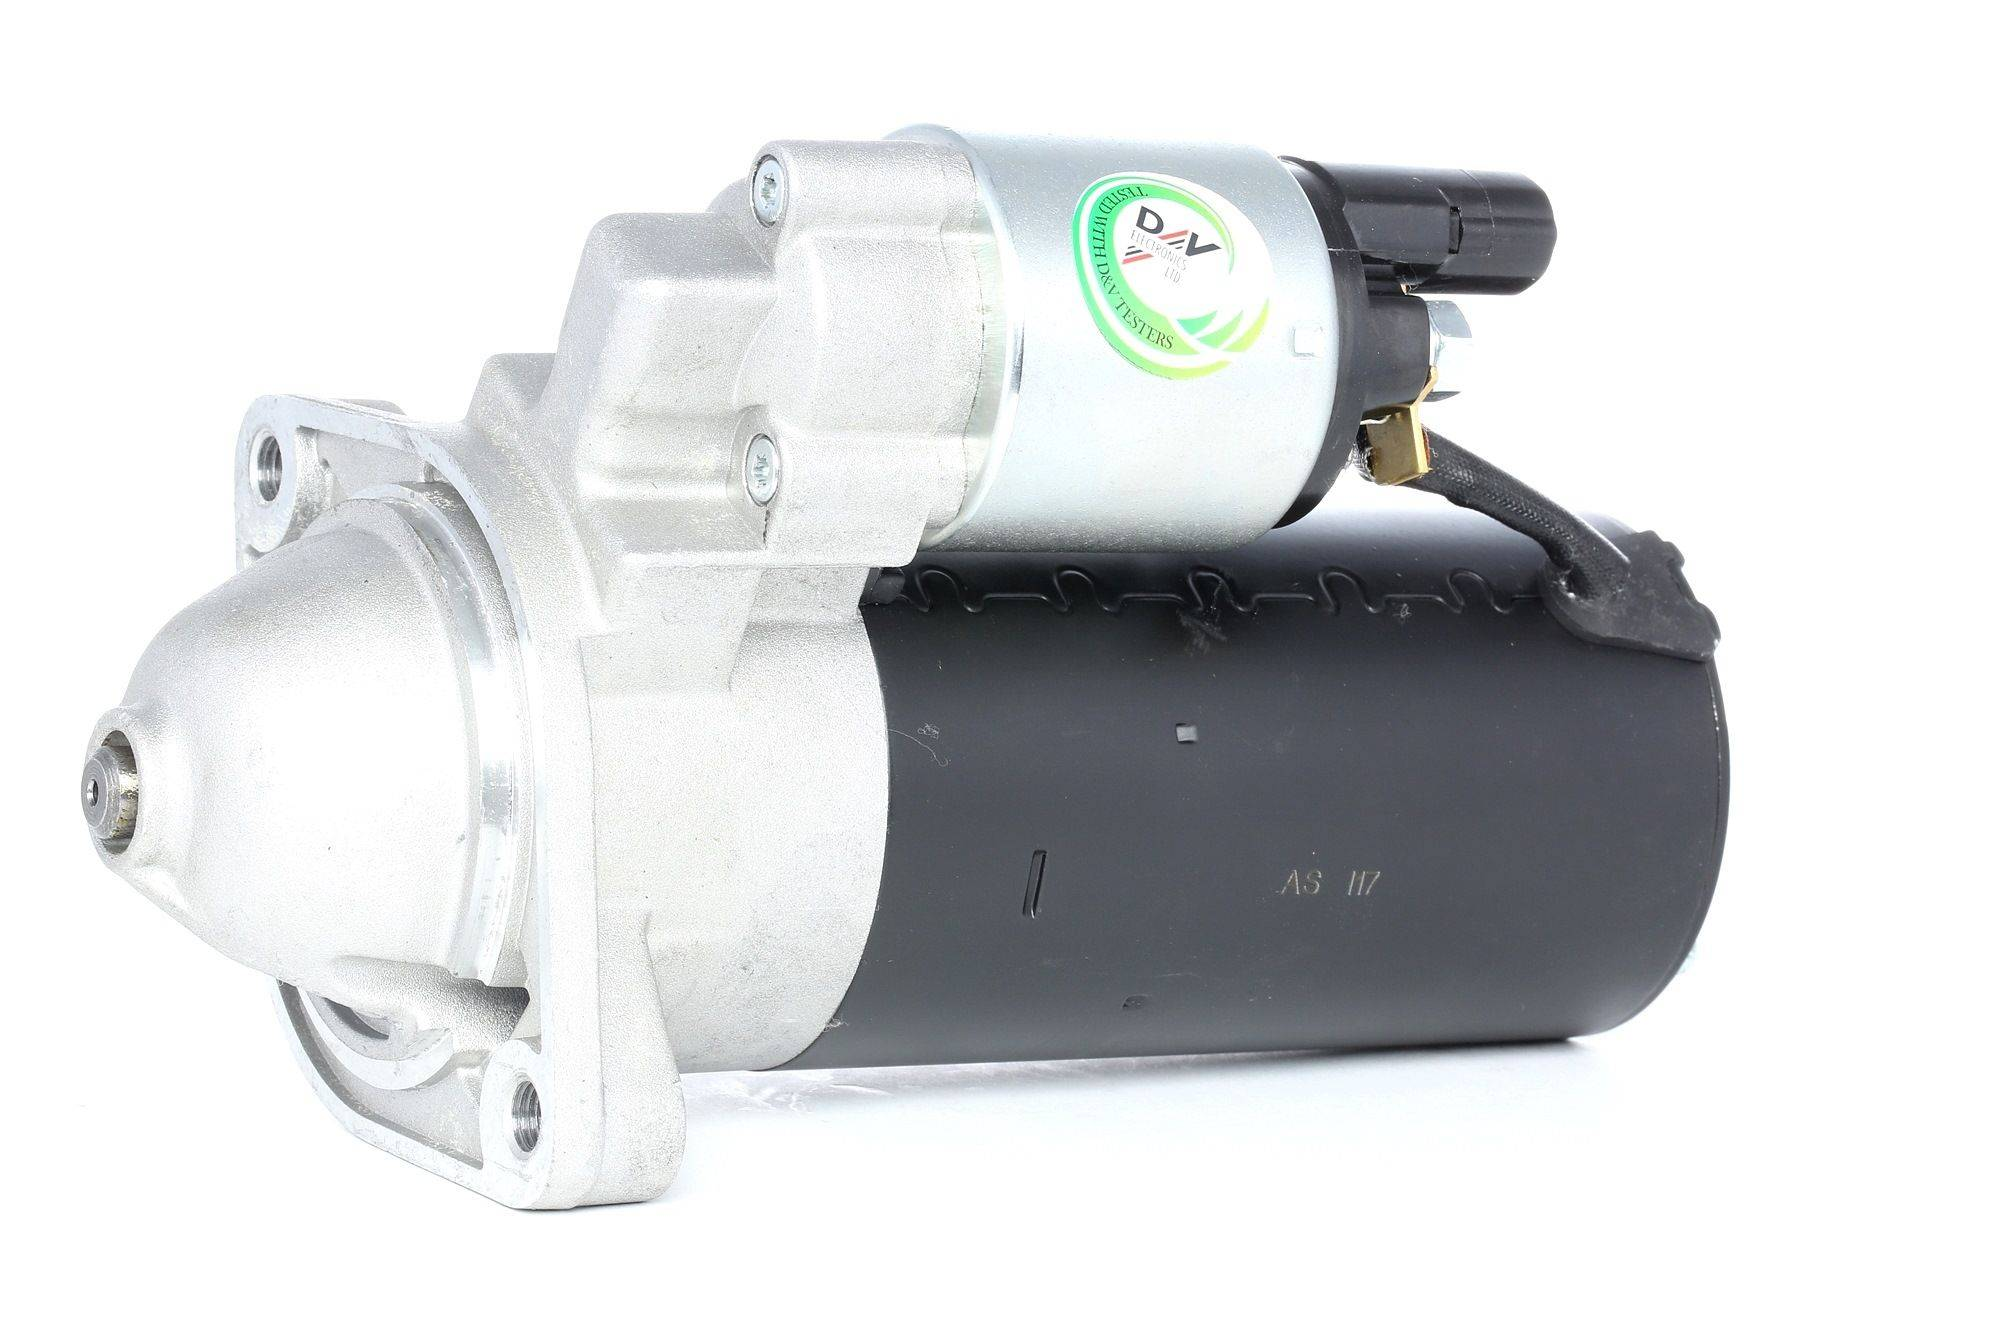 AS-PL Starttimoottori Brand new AS-PL Alternator freewheel pulley S0020 Startti,Käynnistinmoottori TOYOTA,AVENSIS Kombi T25